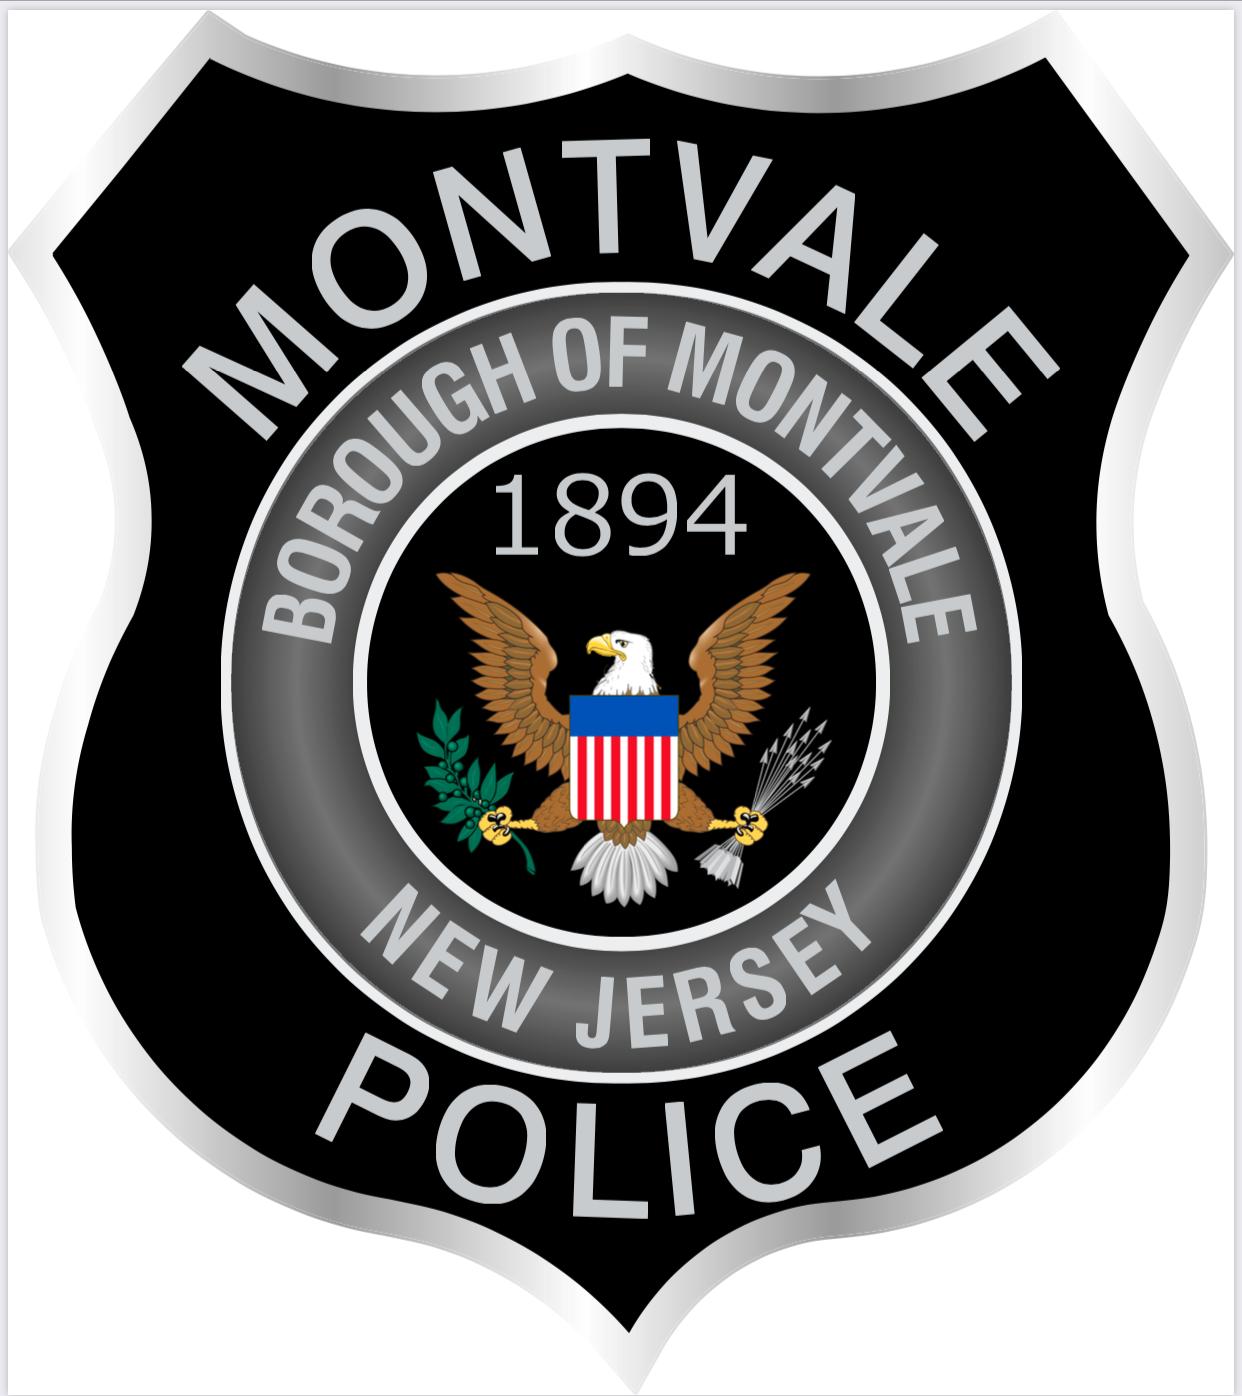 Montvale Police Department No Shave November 2017